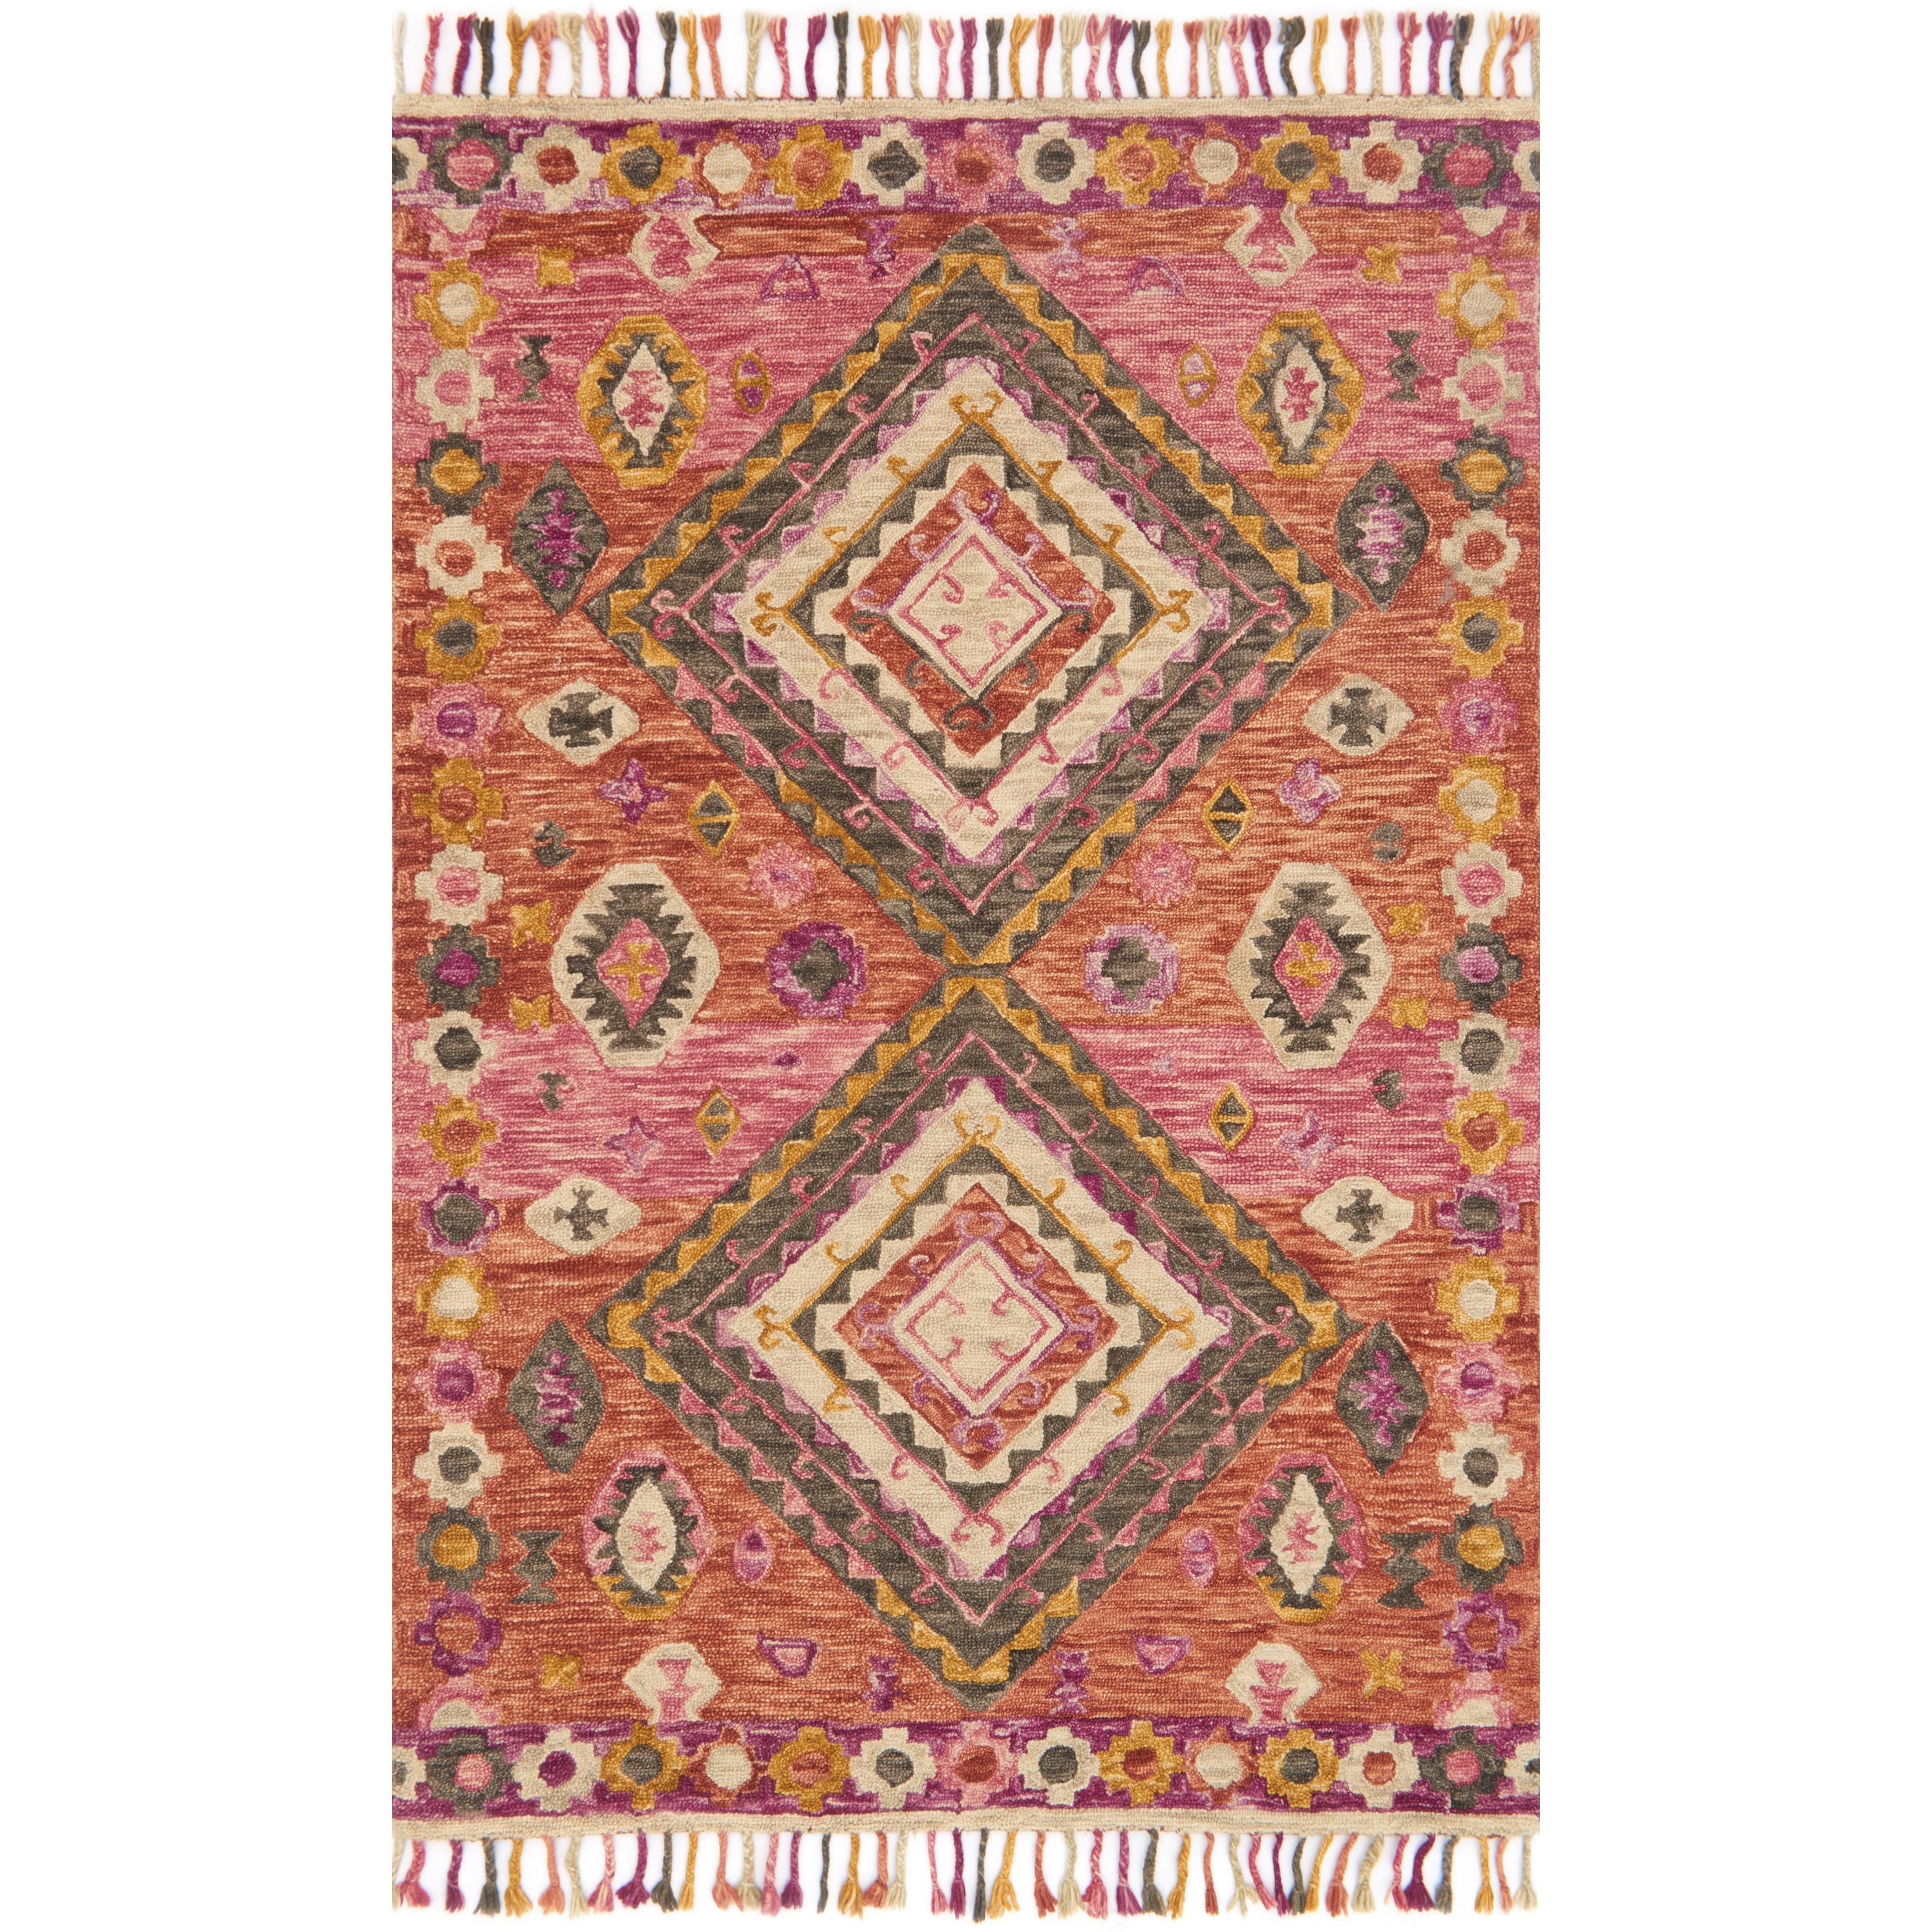 Alexander Home Sonnet Pink/Multi Wool Hand-hooked Rug - 5 x 76 (Fiesta - 5 x 76)